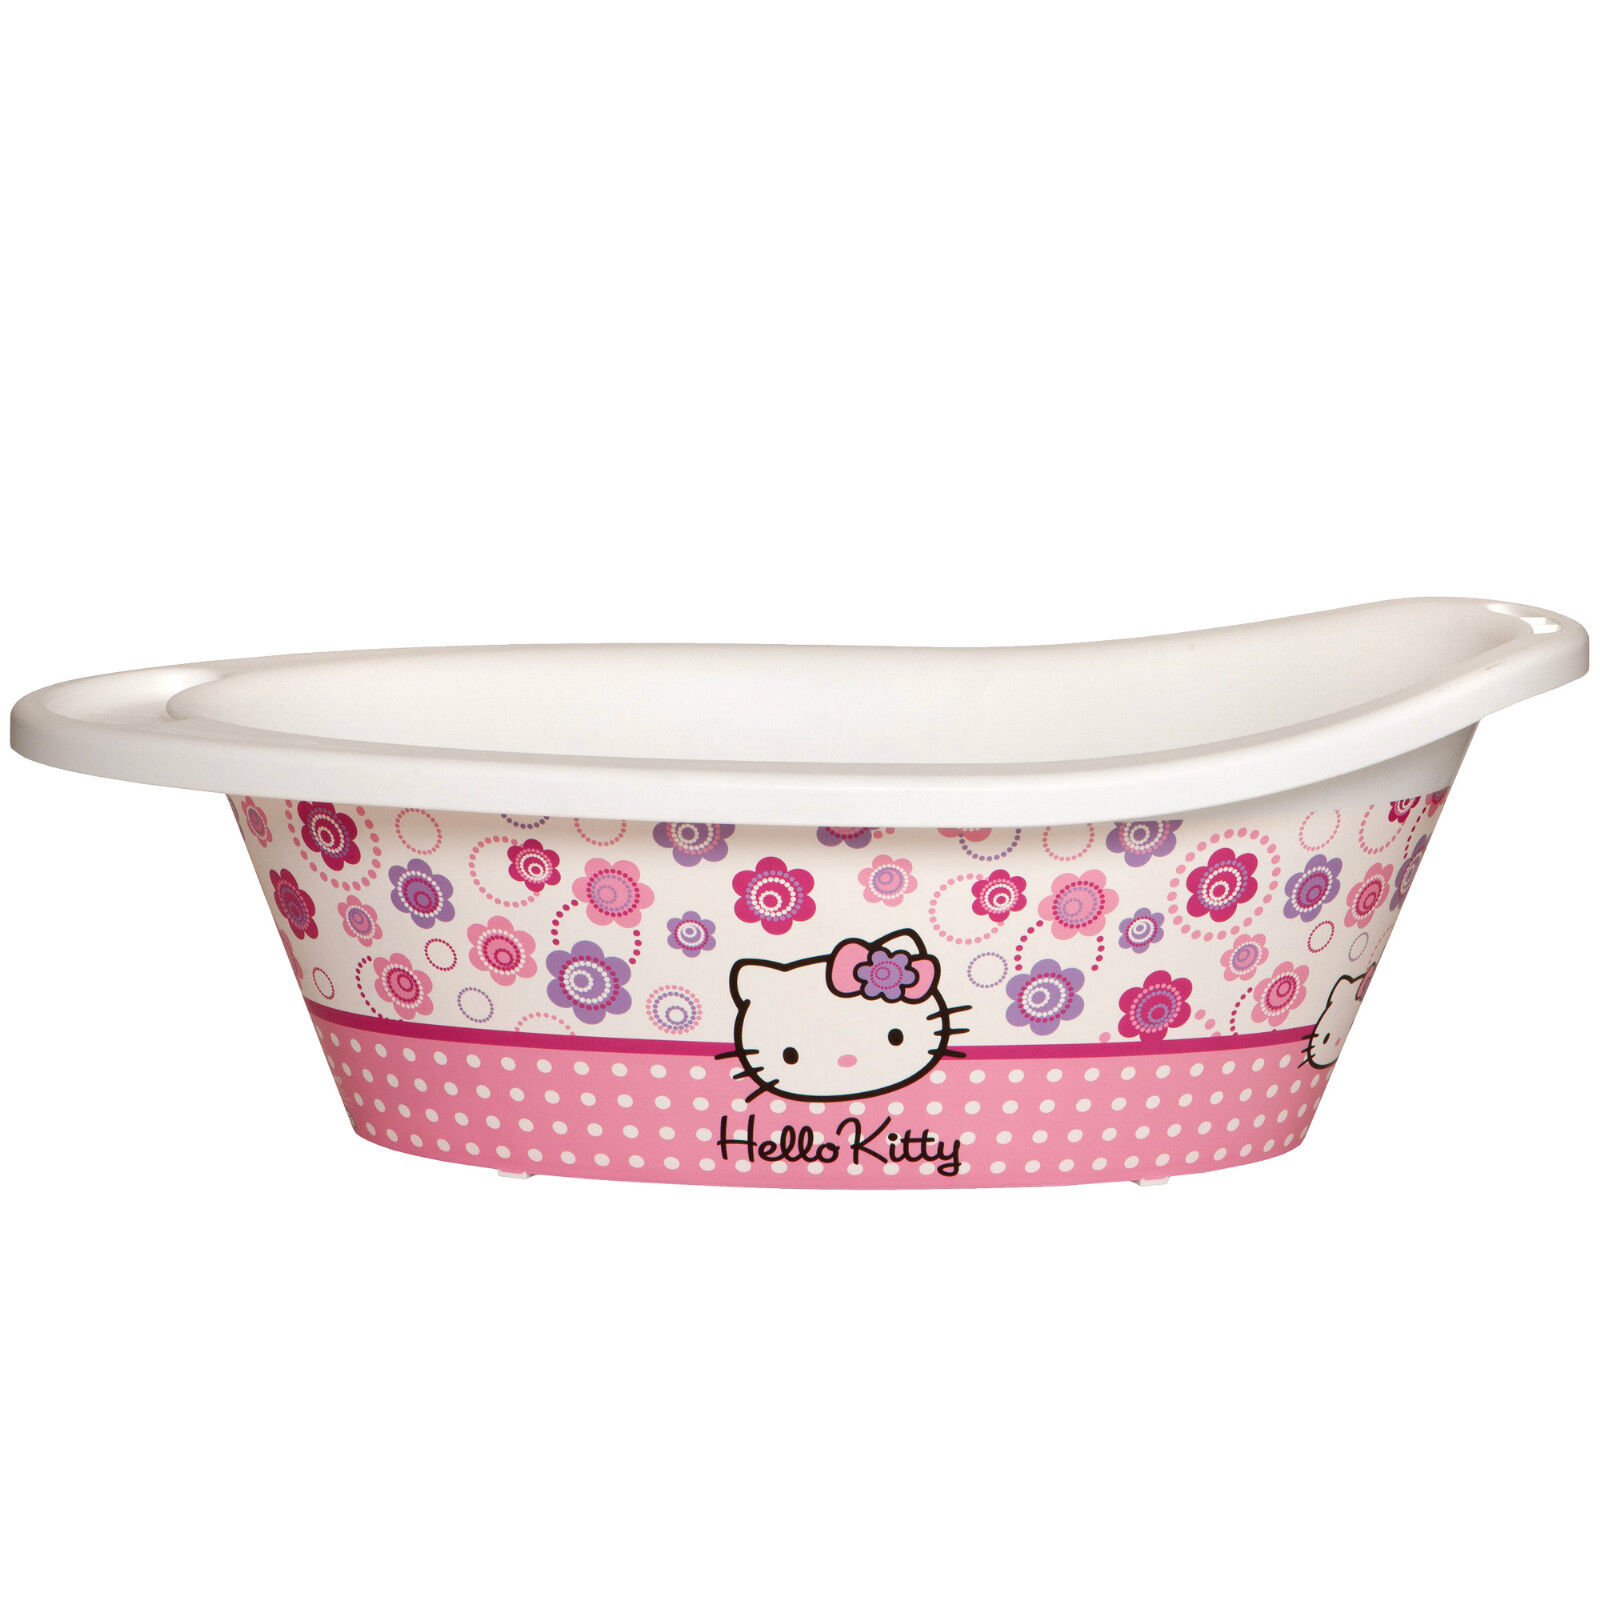 hello kitty baby bath tub for newborn 12 months anti slip babies 0 3 6 rrp 30 ebay. Black Bedroom Furniture Sets. Home Design Ideas